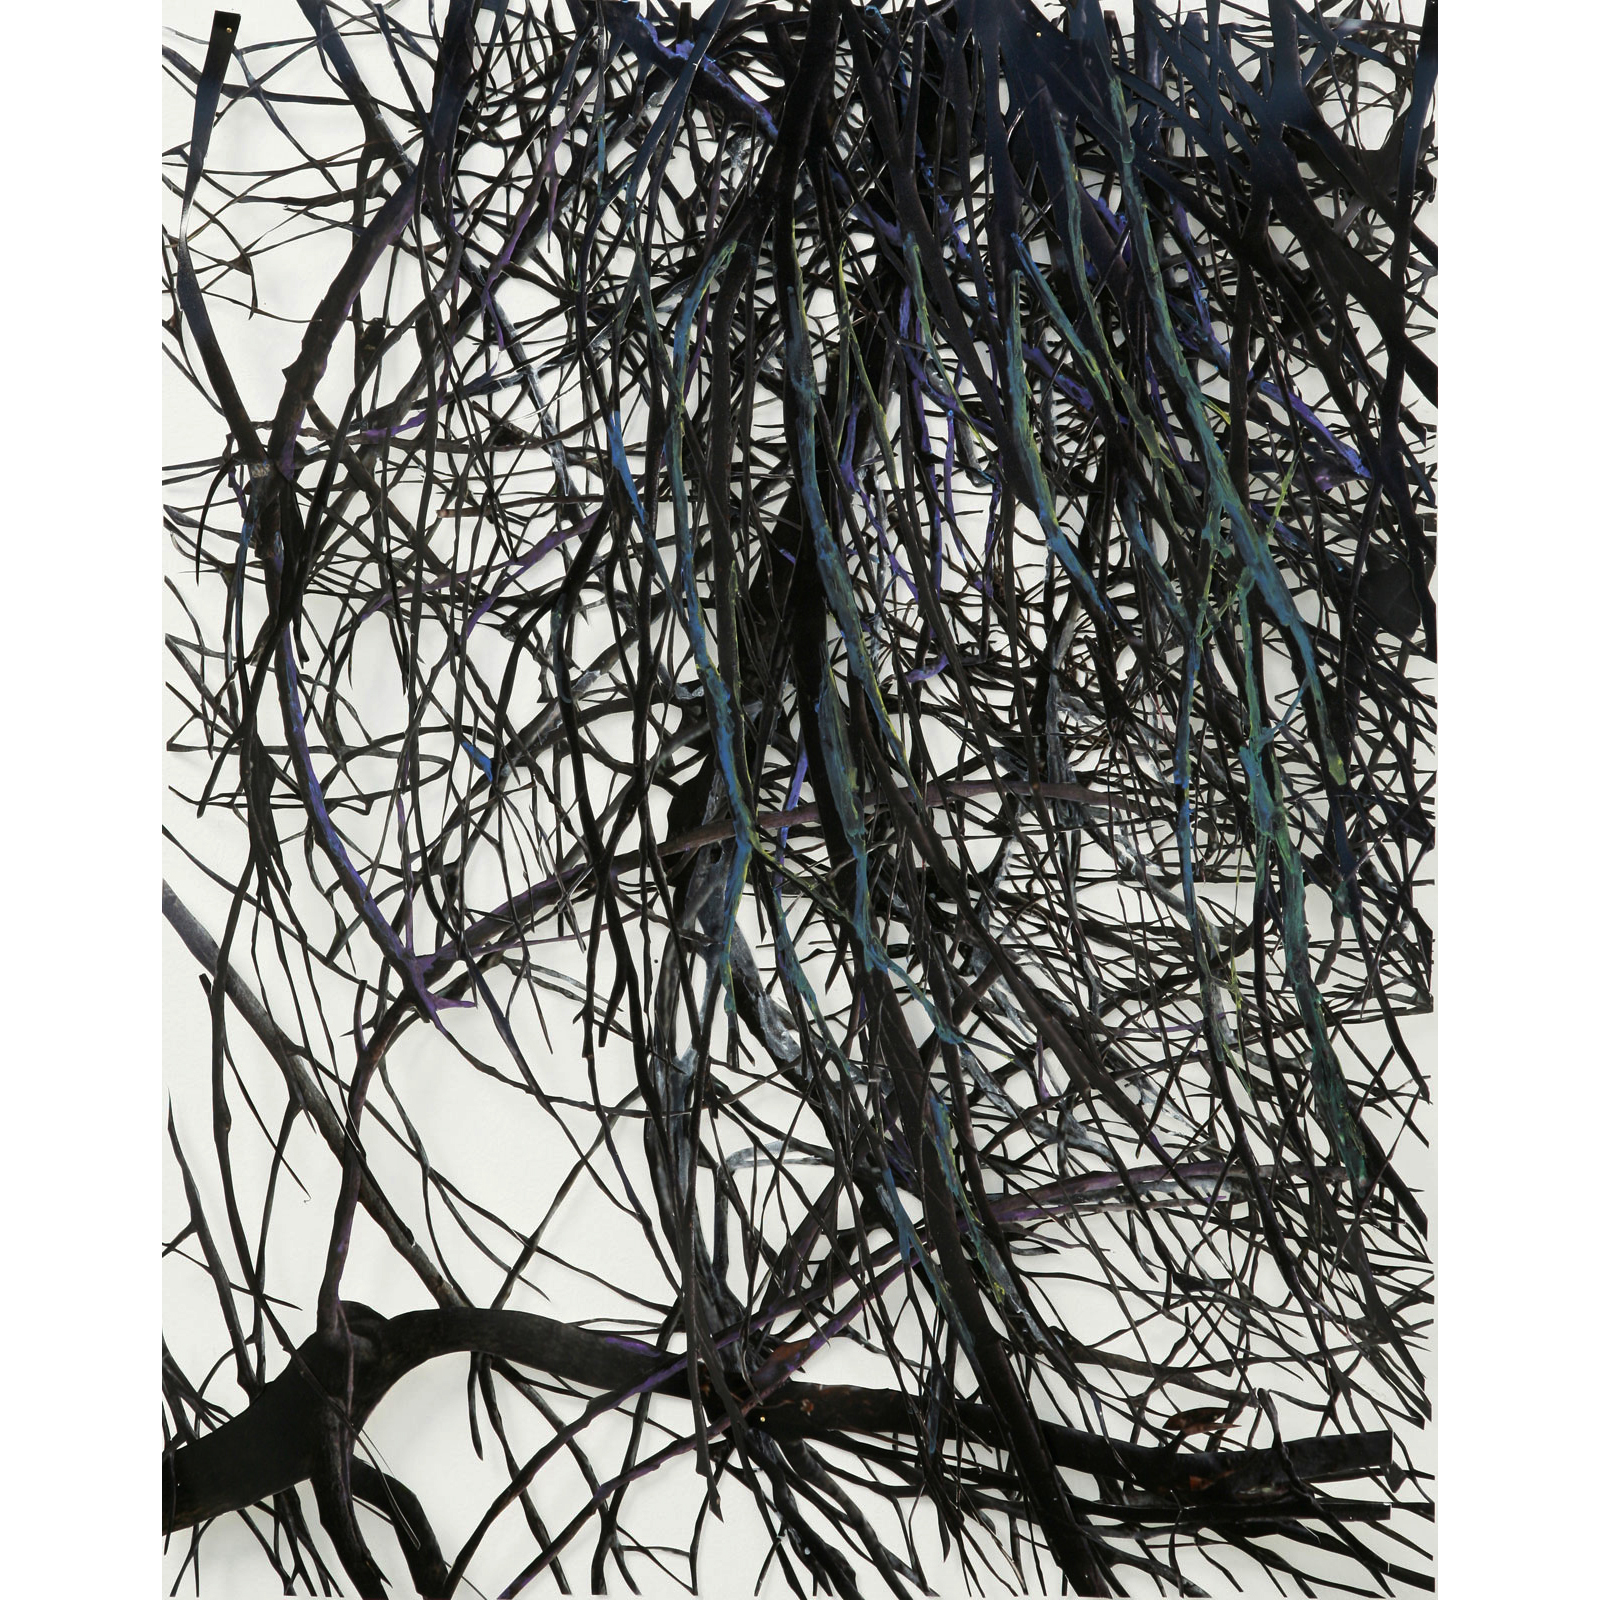 "Strange Lull II,   hand-cut c-prints, collage, colored pencil, 14"" x 11"", 2008."